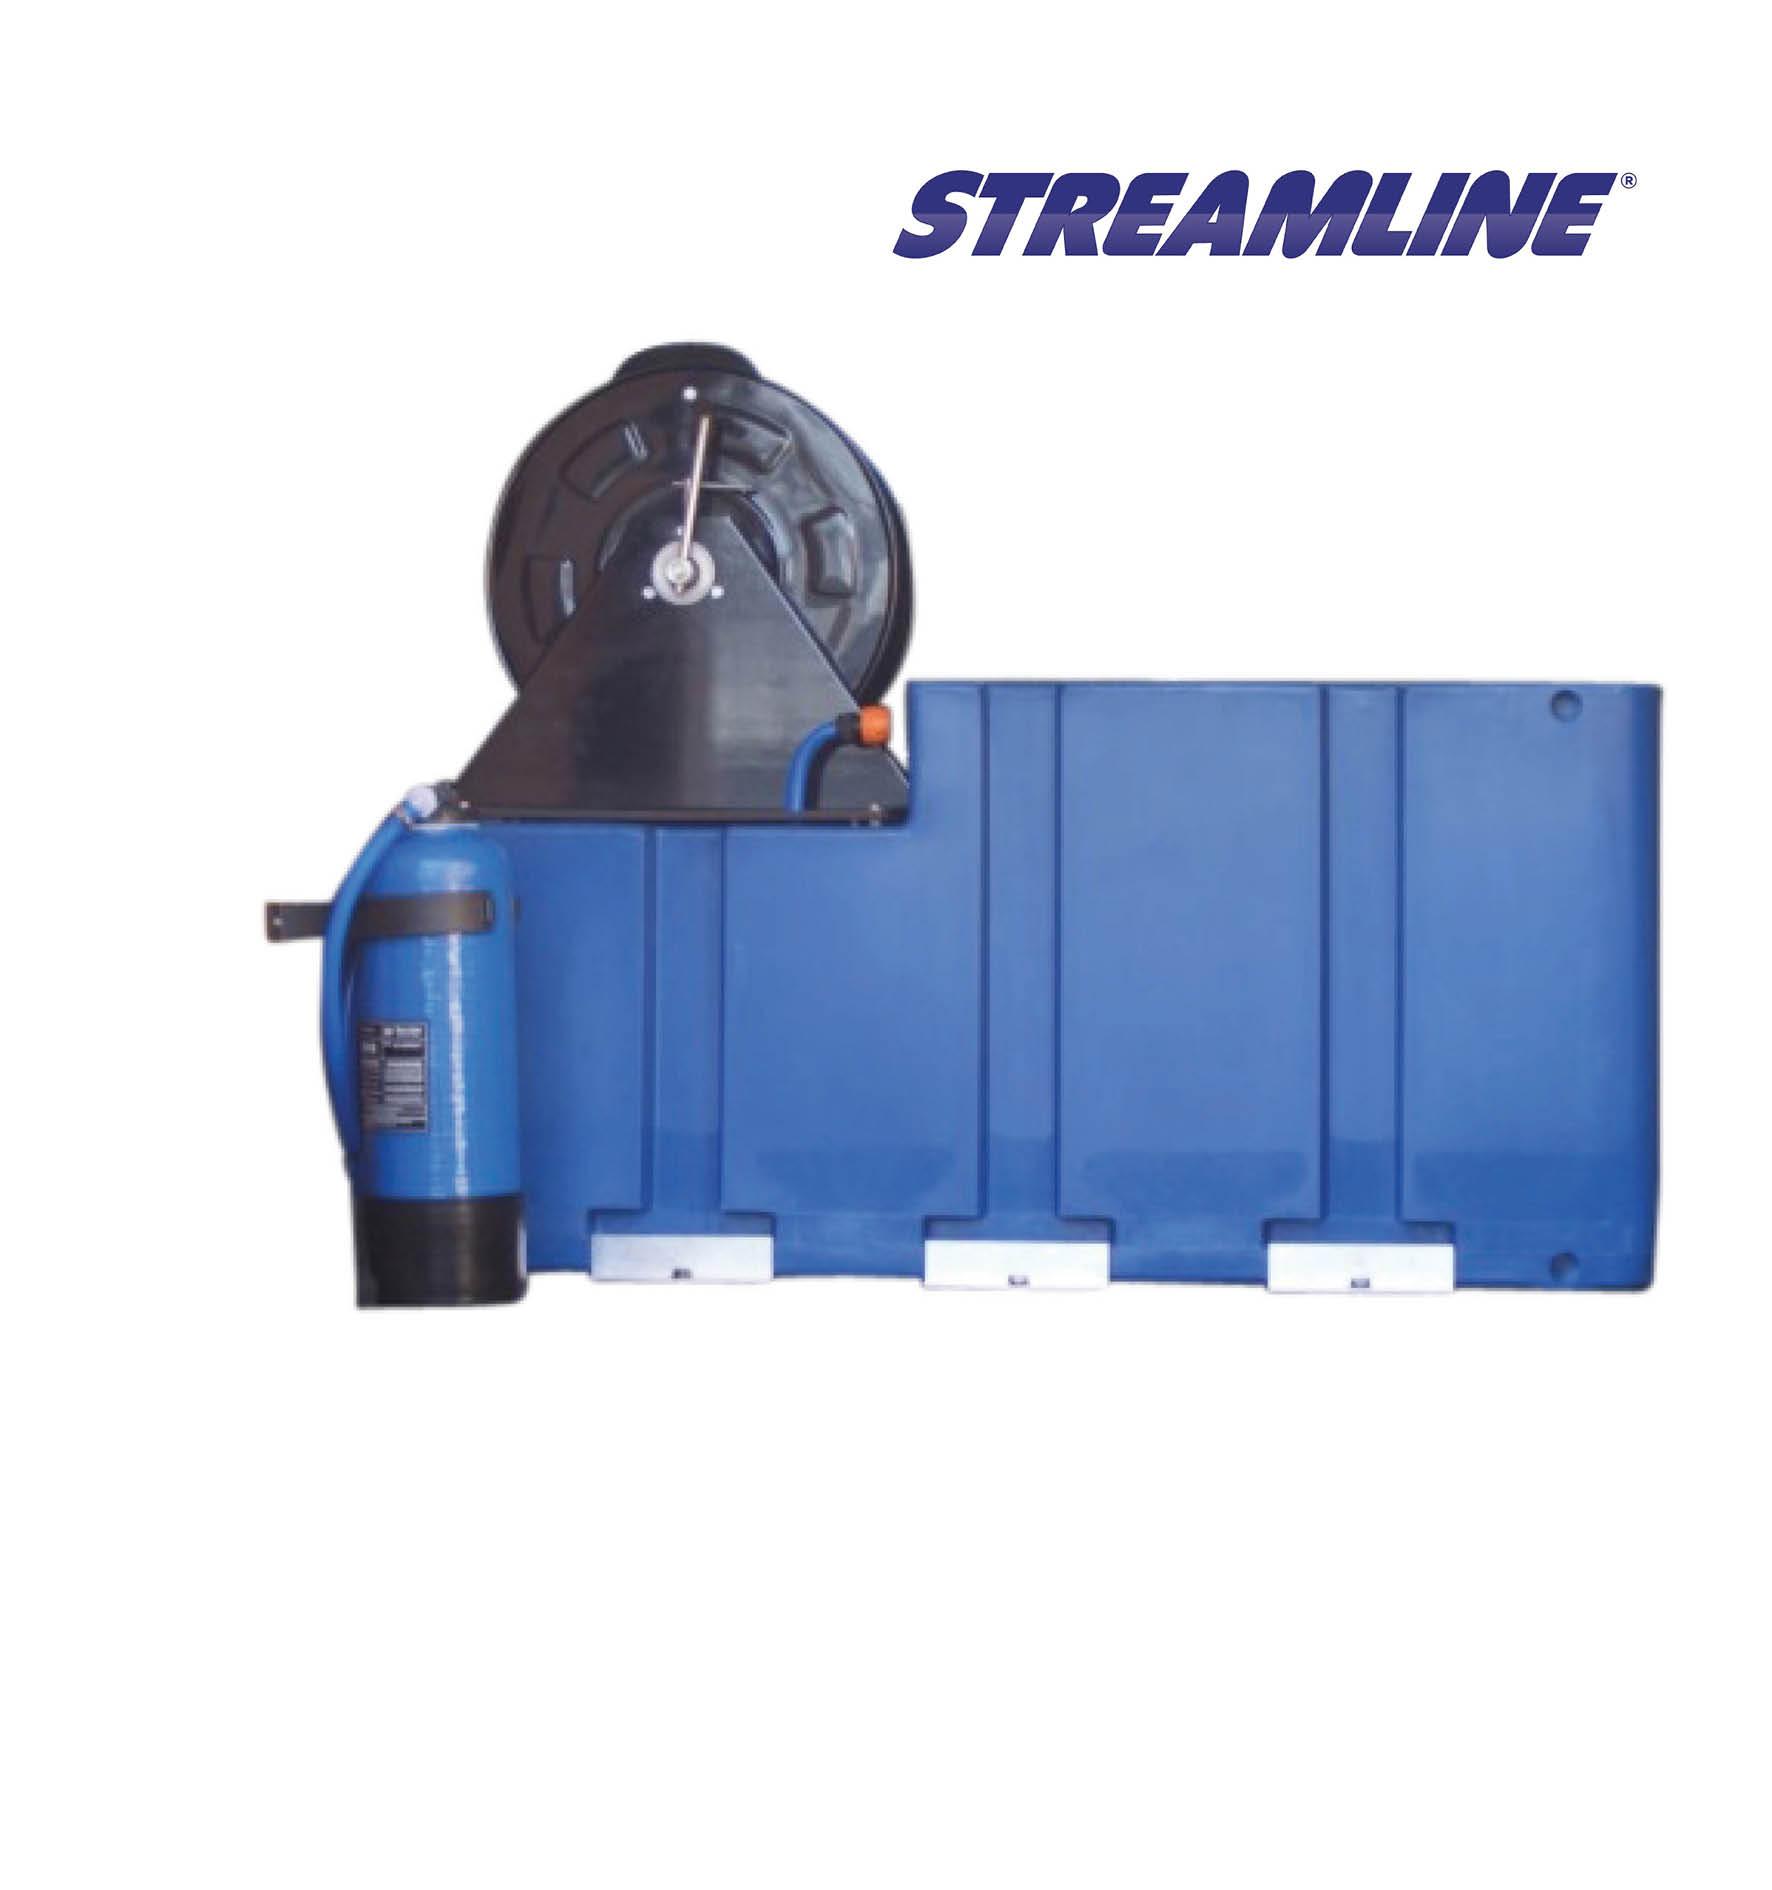 Ecostream Interlock 400 Litre Window Cleaning Tank System